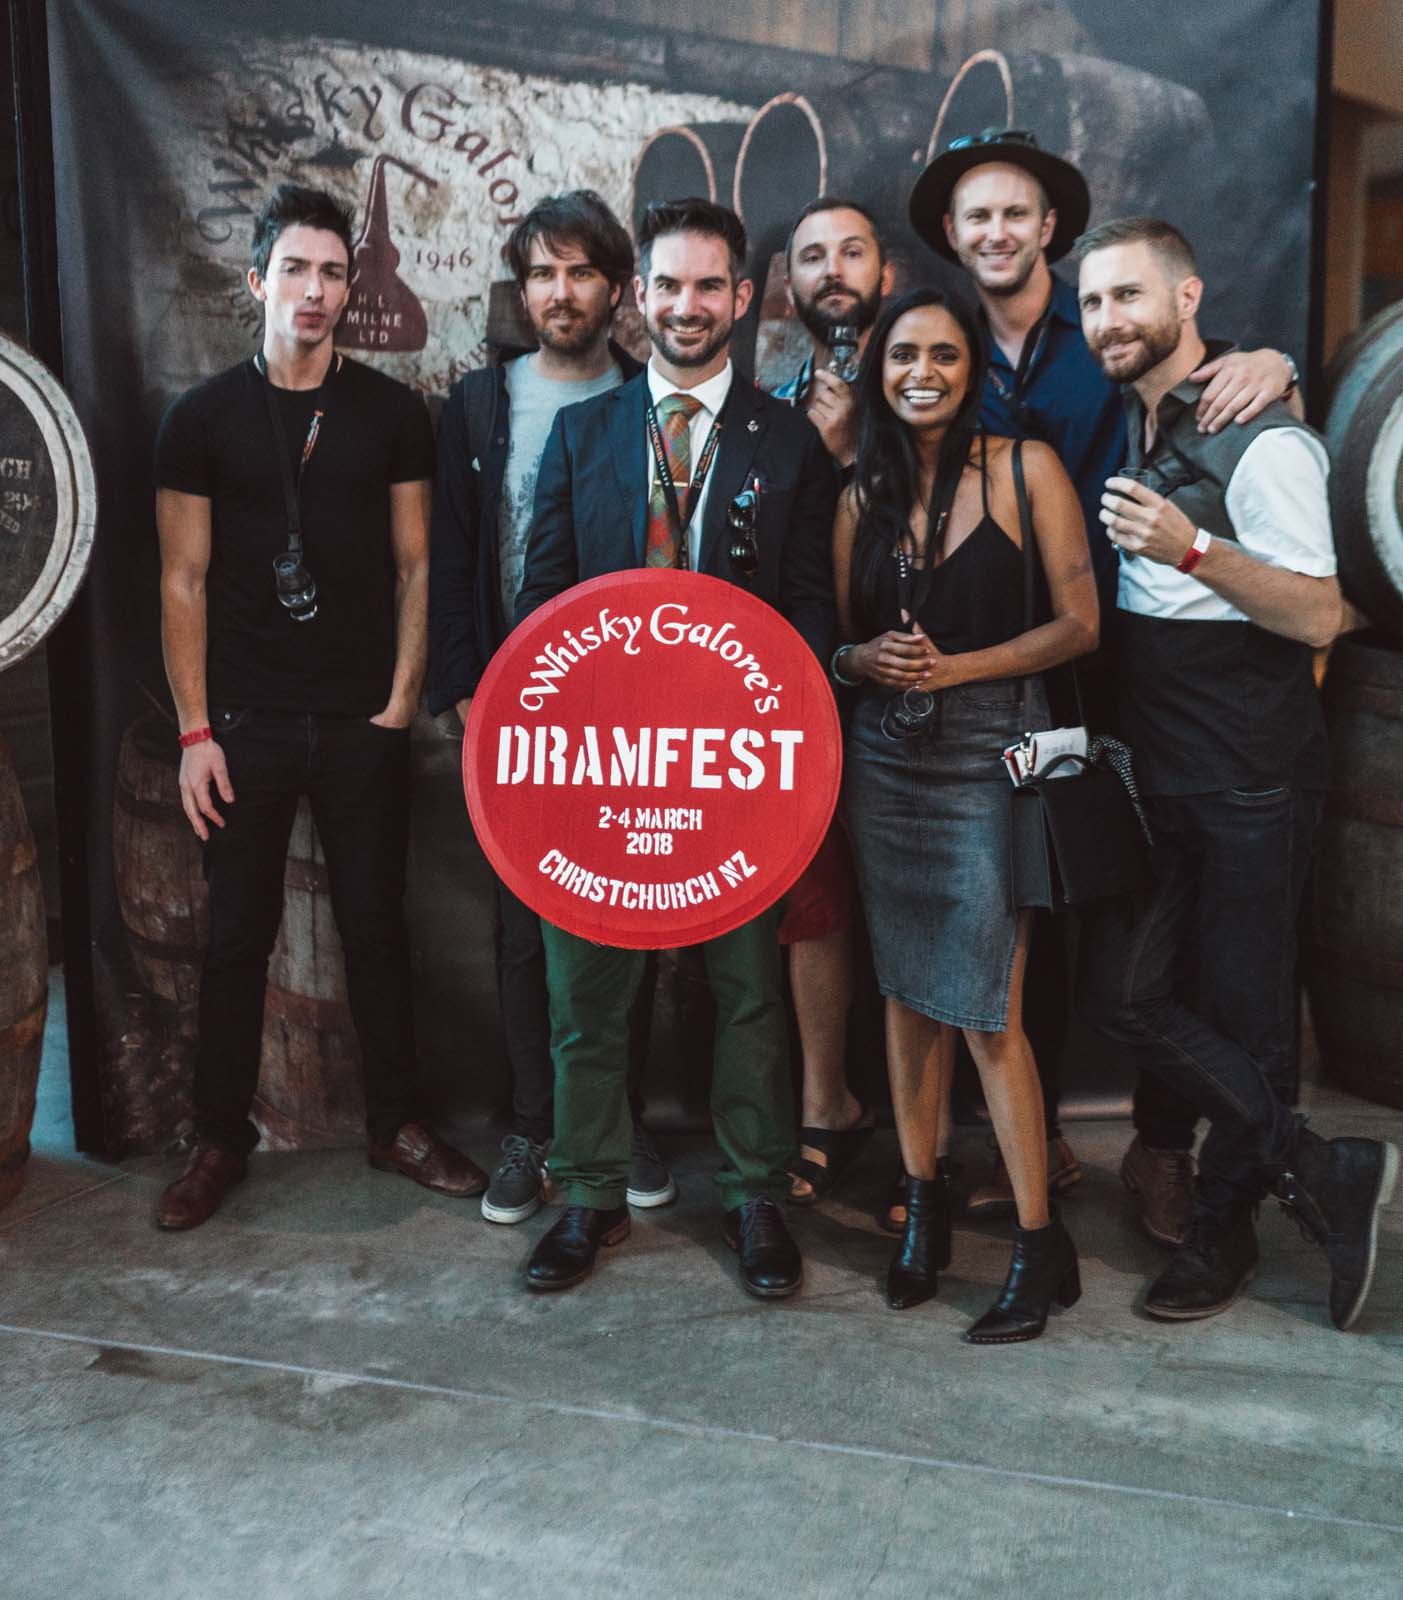 Dramfest 2018 for Whisky Galore-165.jpg